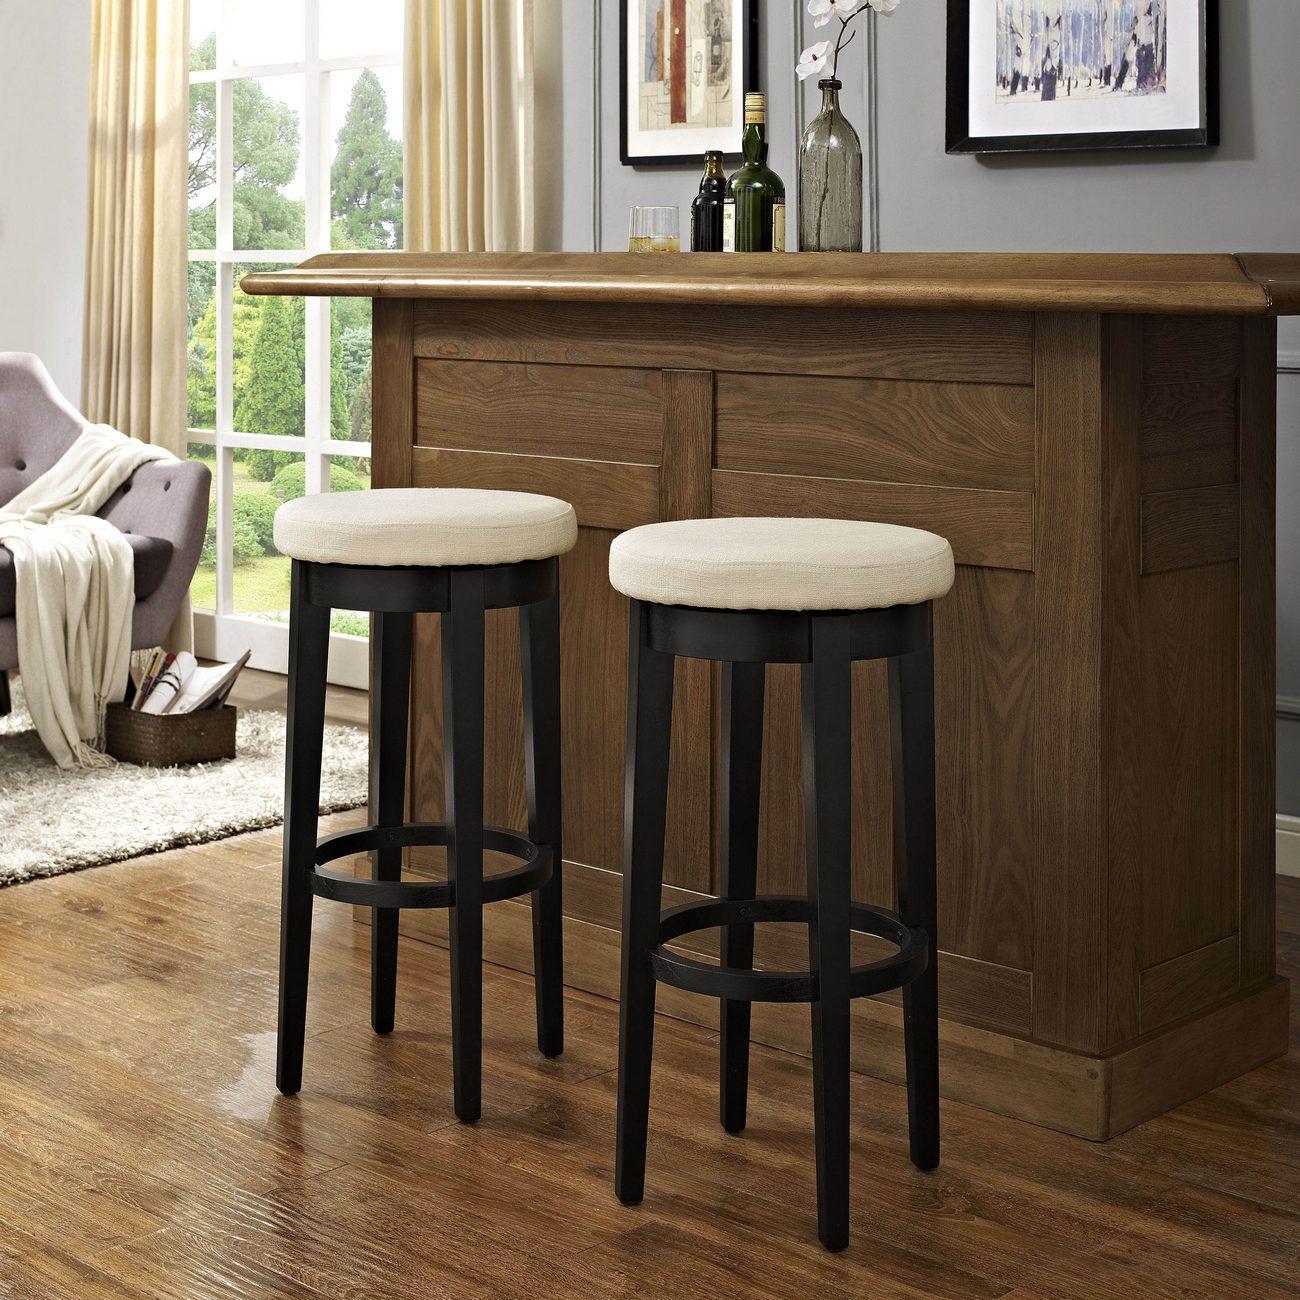 Mitchell Swivel Bar Stool In Black W Creme Cushion Set Of 2